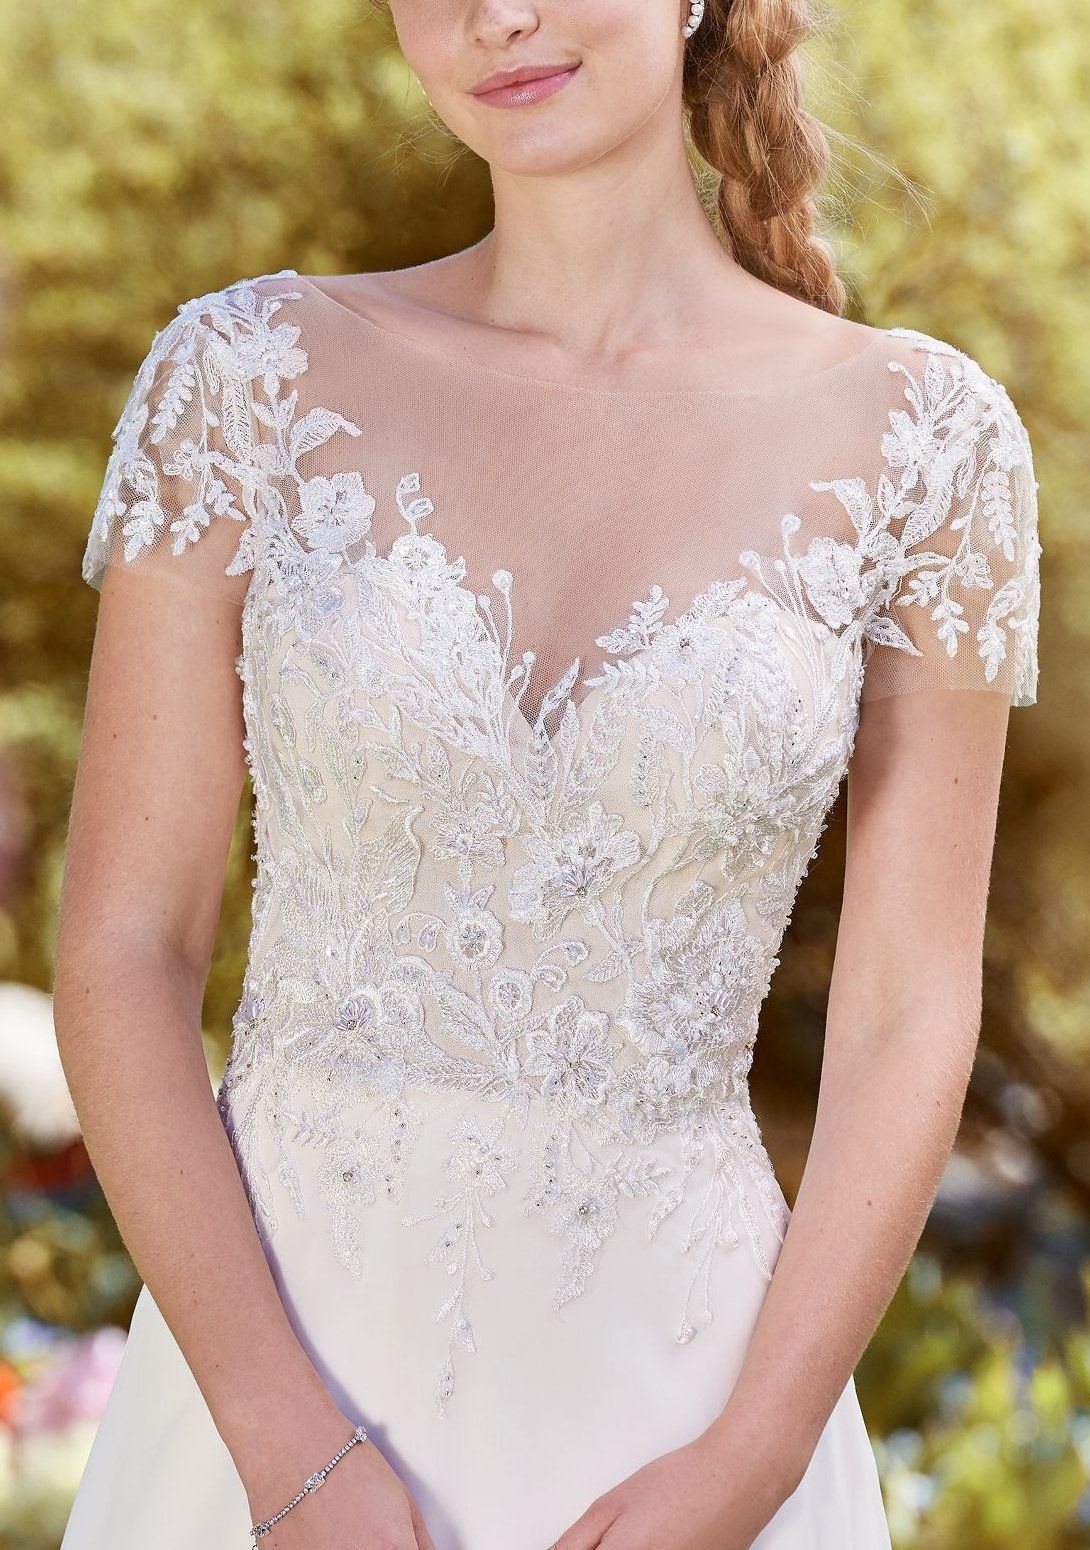 Mercy By Rebecca Ingram Wedding Dresses And Accessories Wedding Dresses British Wedding Dresses Short Wedding Dress [ 1550 x 1090 Pixel ]